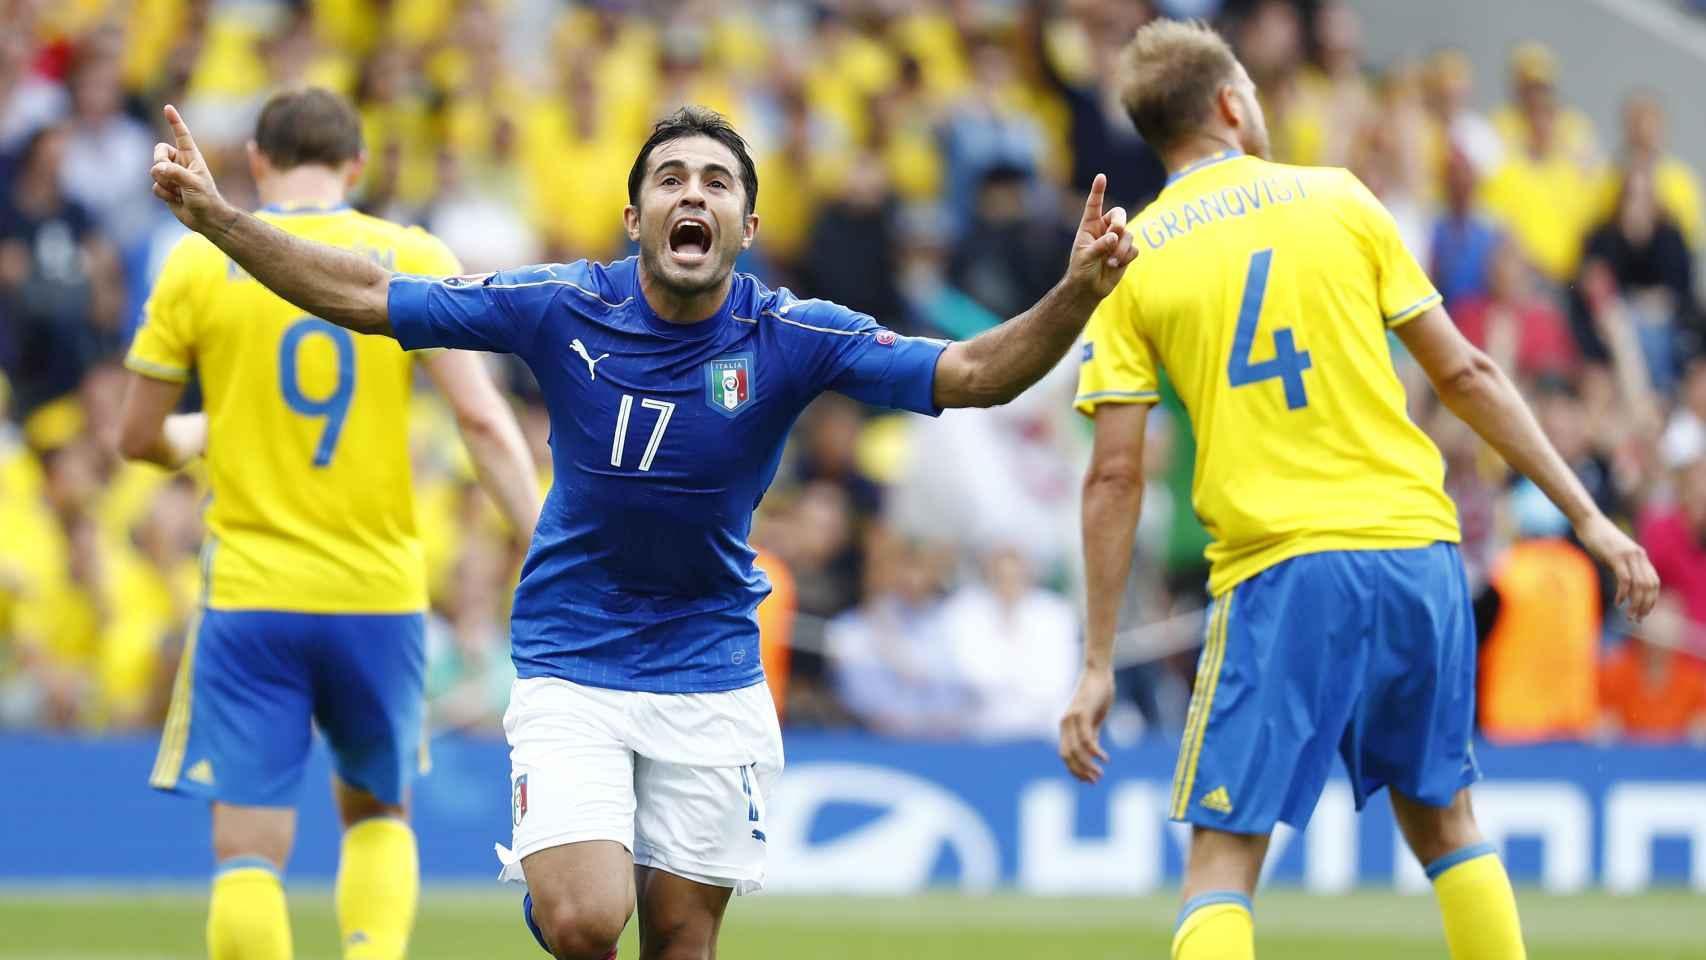 Eder celebra su gol ante Suecia.